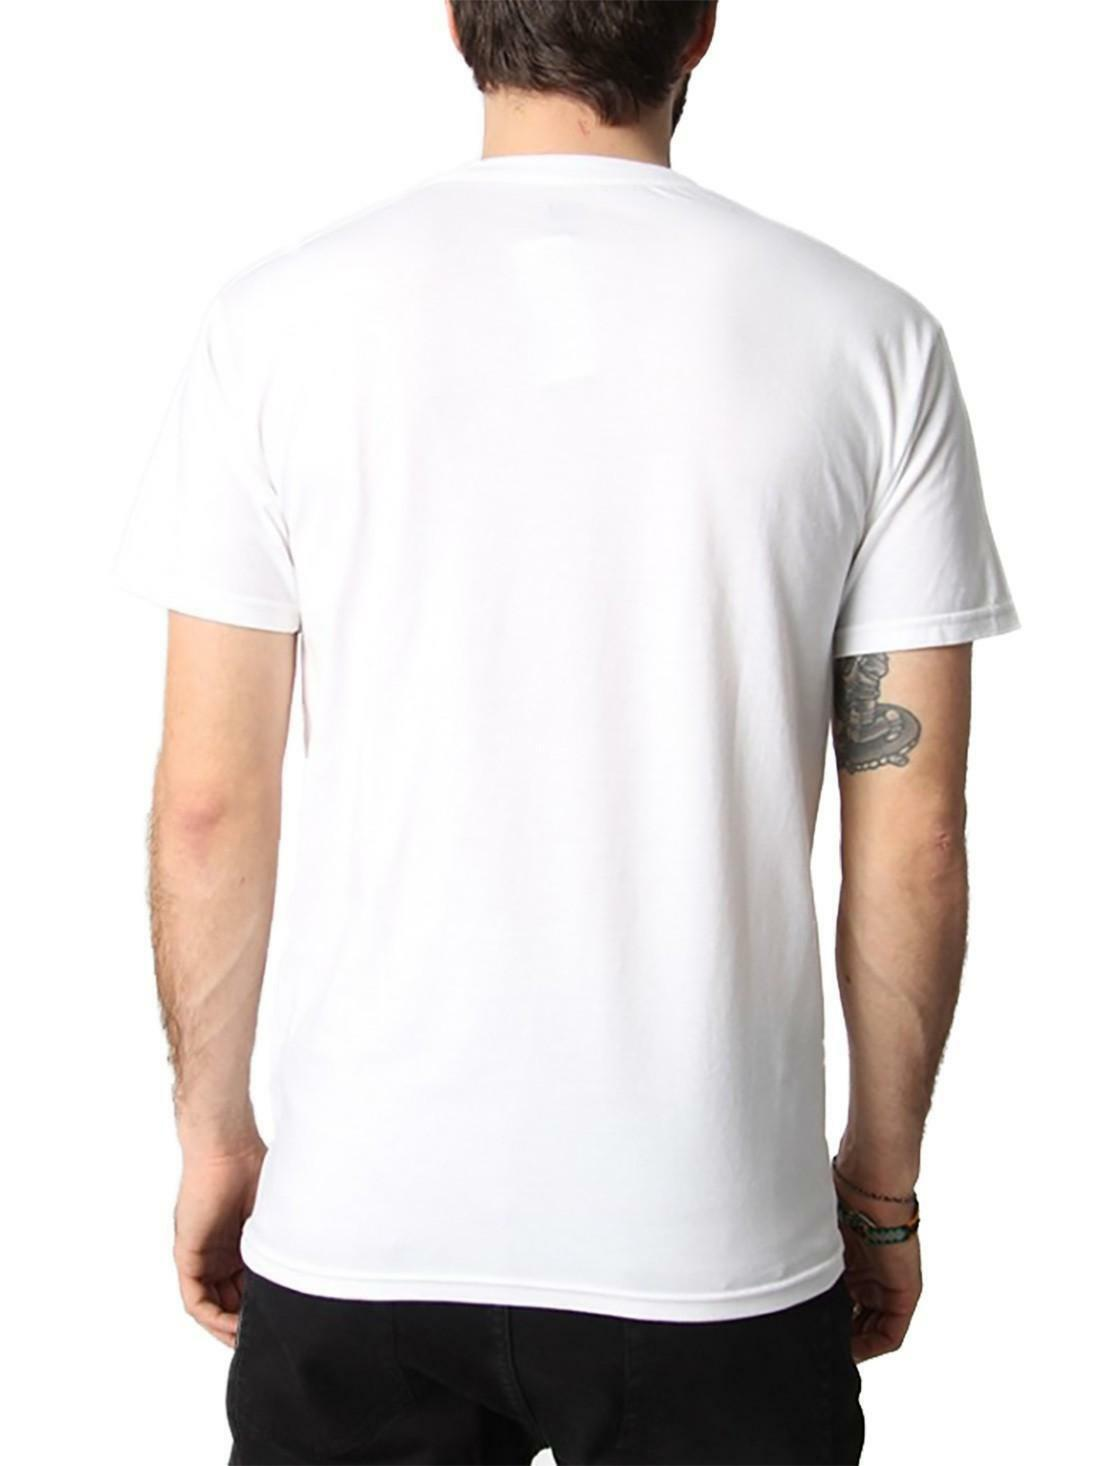 obey obey typewritter t-shirt uomo bianca 165371657wht